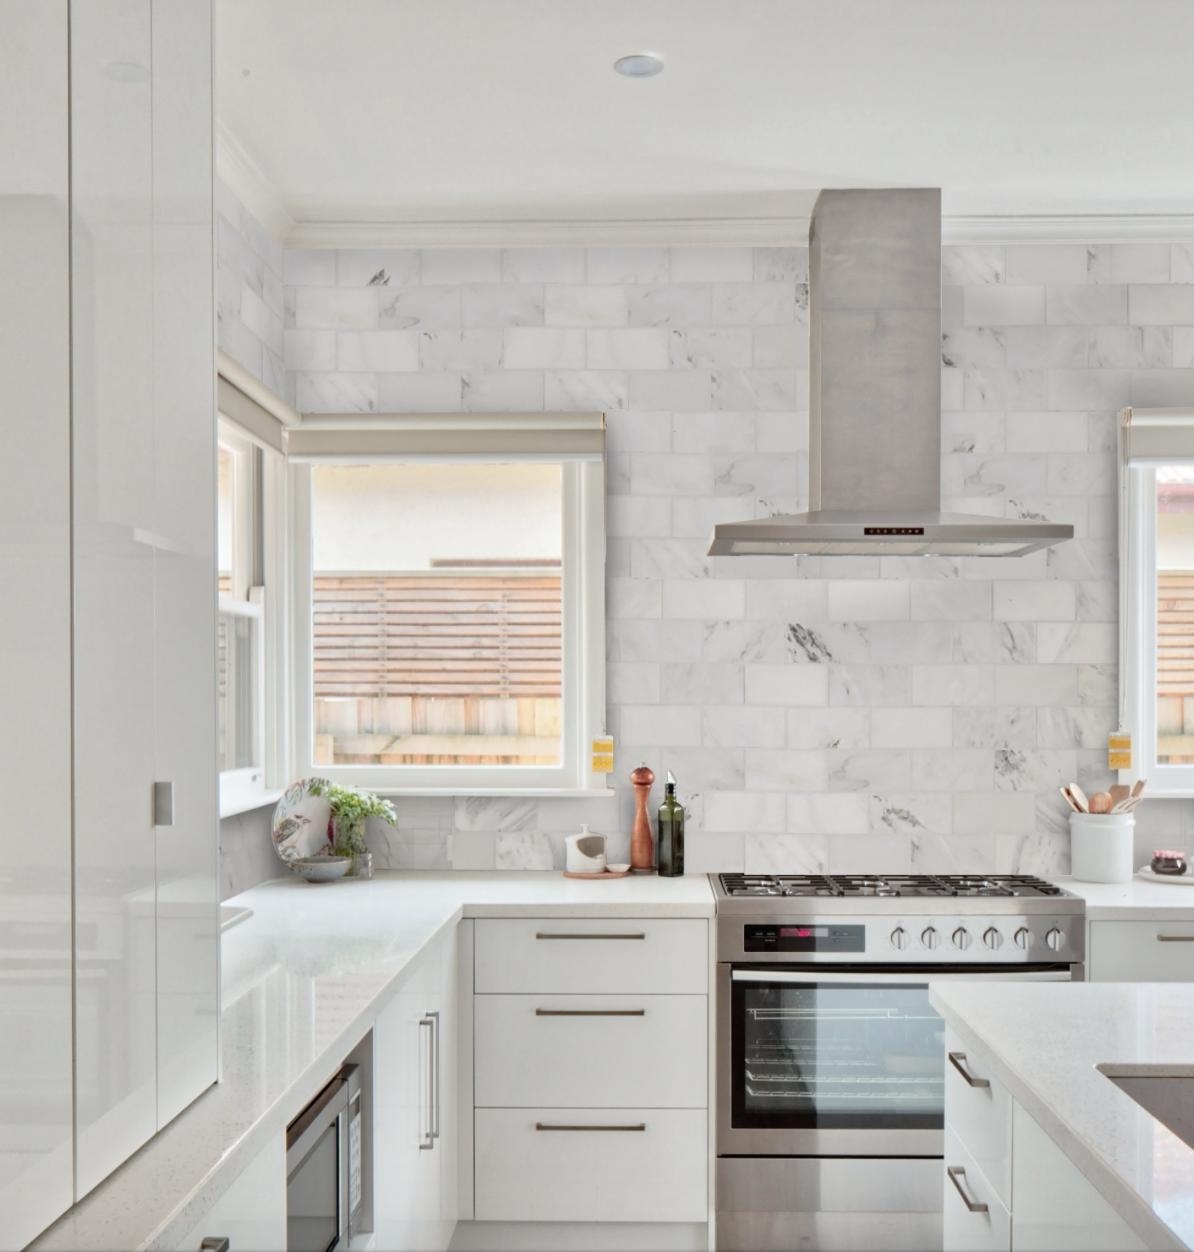 Cle Basics Carrara Oversized Subway Tile 6 X12 X3 8 Simple Kitchen Kitchen Trends Kitchen Backsplash Trends